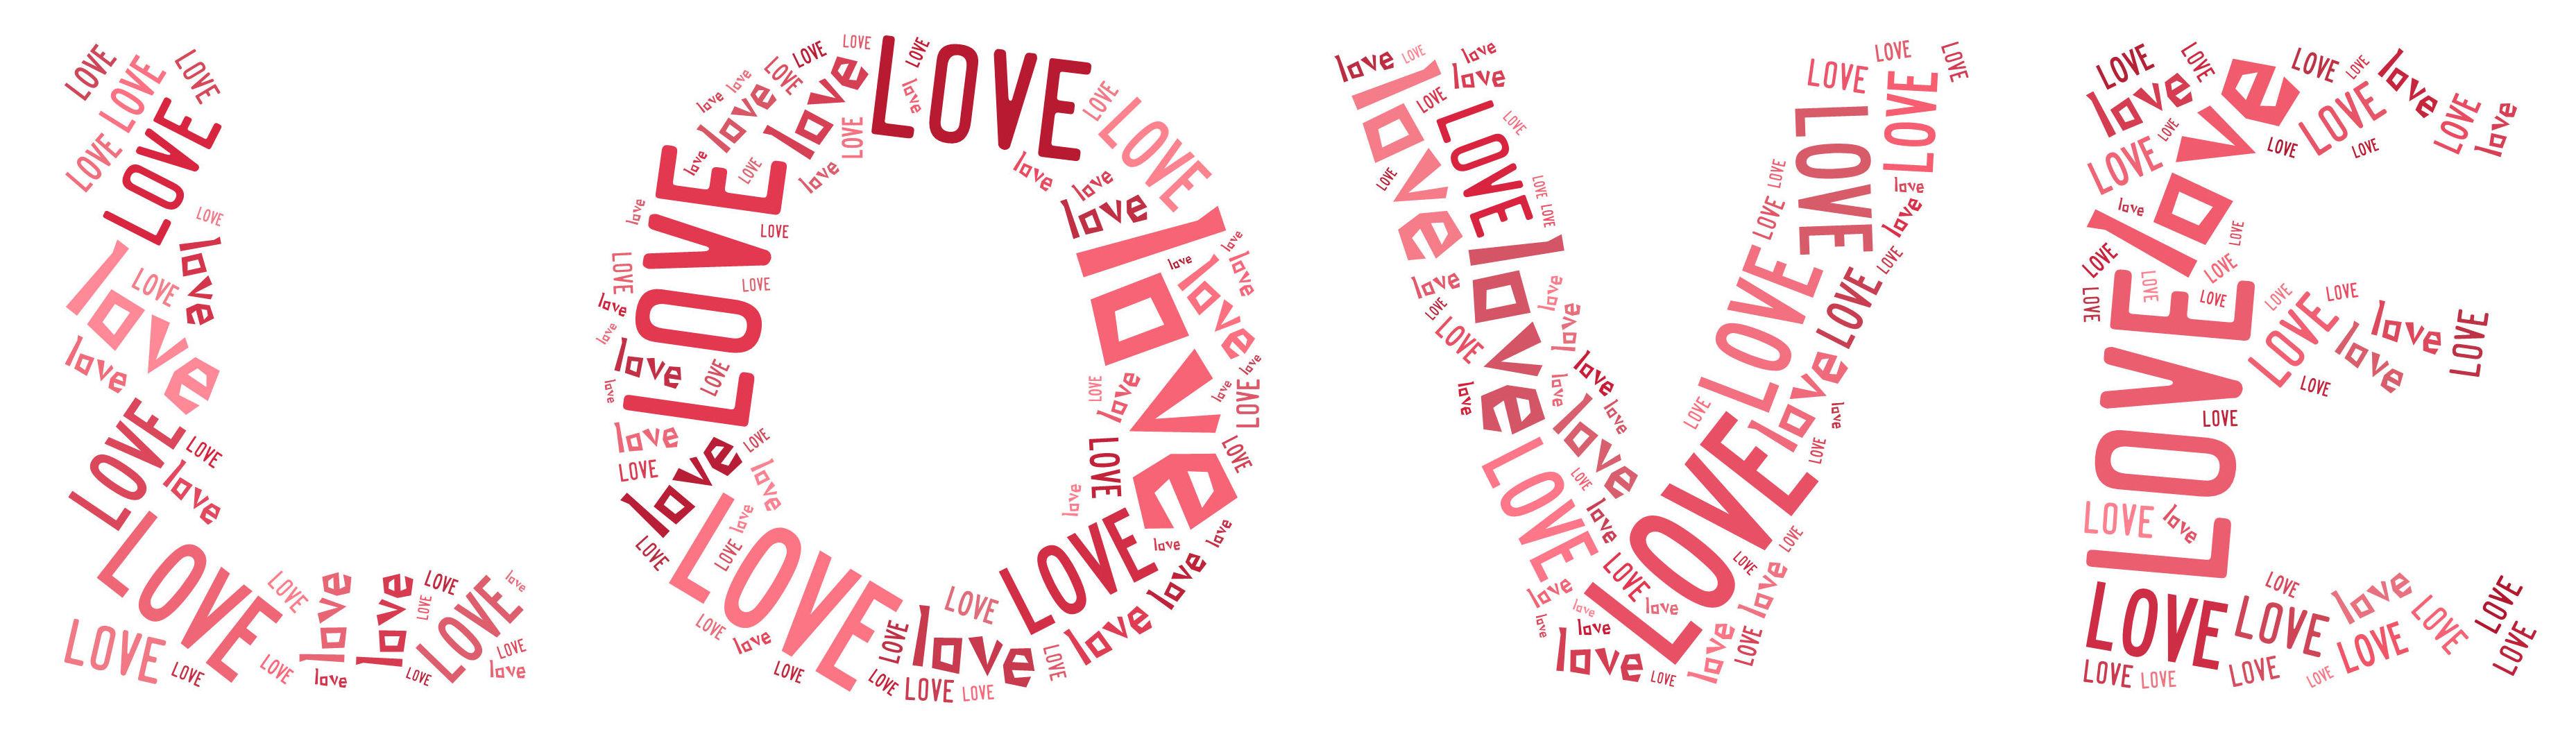 Love word art freebies : Vancouver wa coupon blog